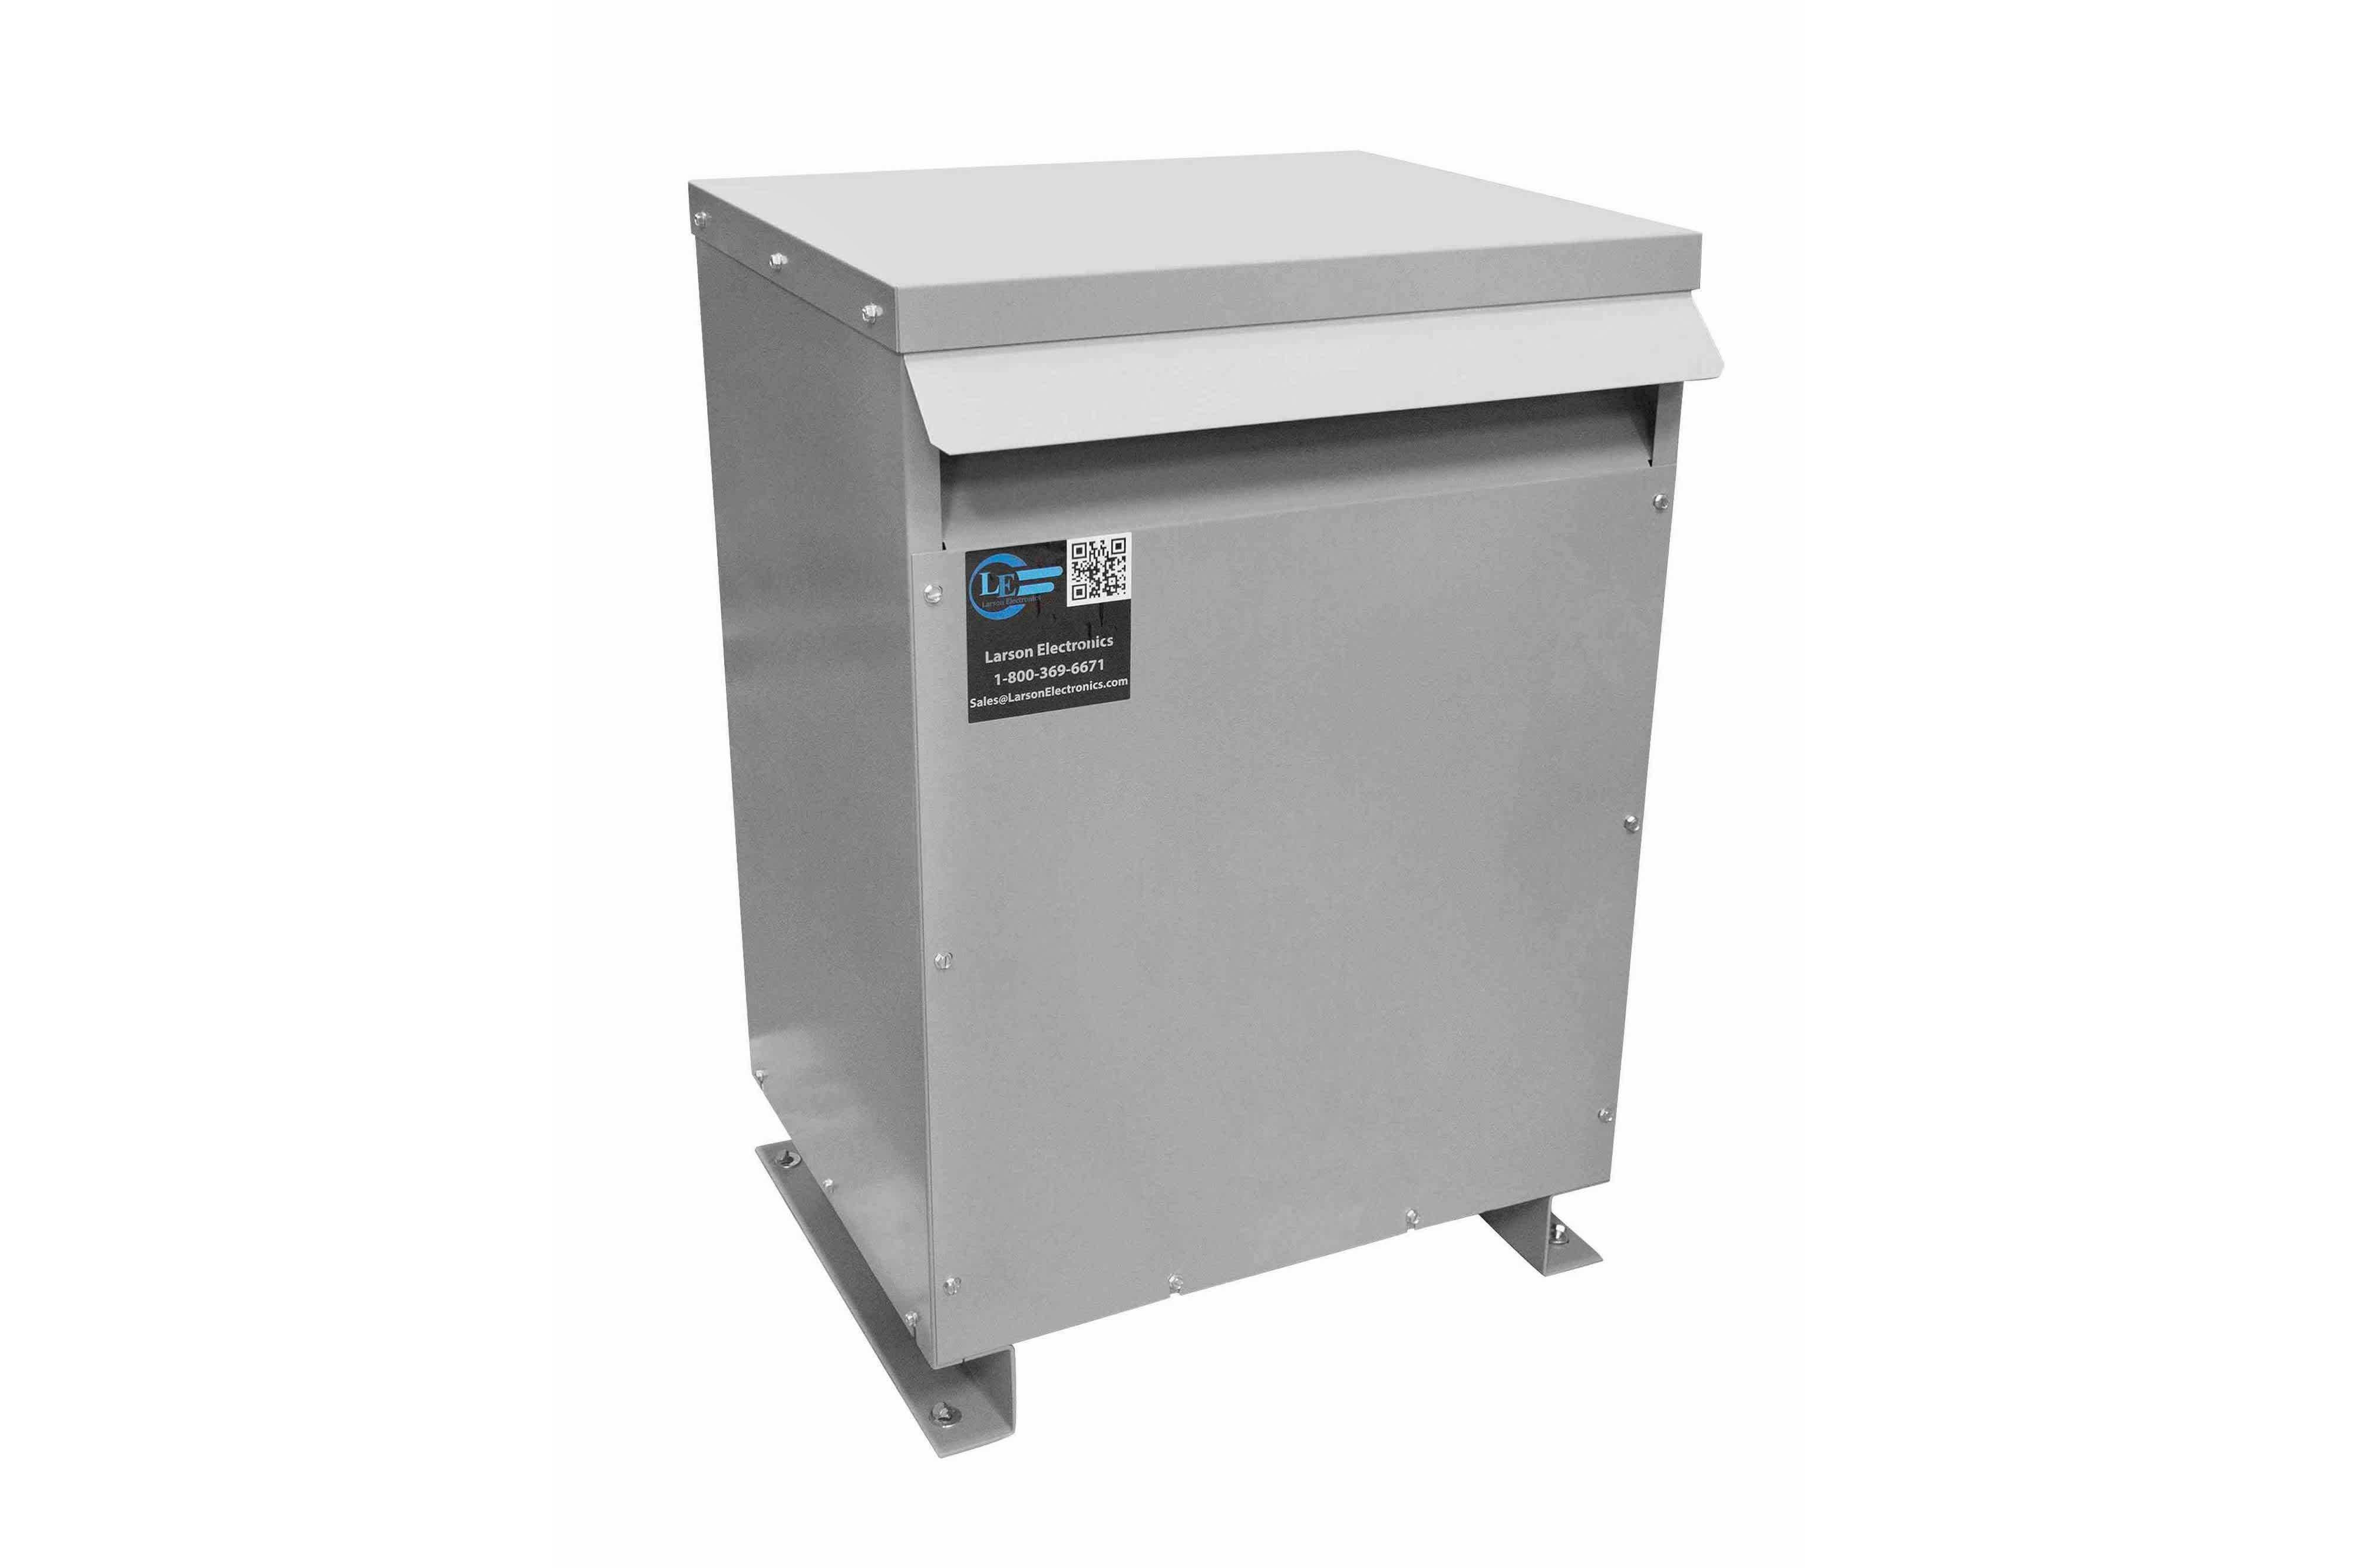 55 kVA 3PH Isolation Transformer, 400V Wye Primary, 208V Delta Secondary, N3R, Ventilated, 60 Hz